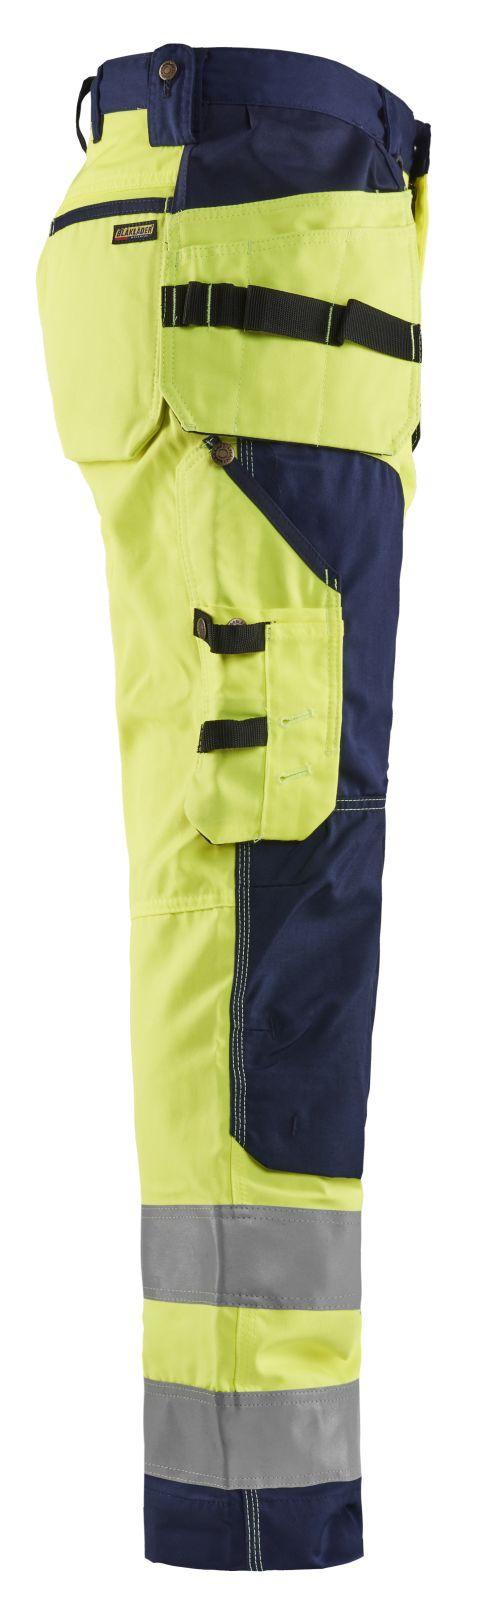 Blaklader Werkbroeken 15681811 High Vis geel-marineblauw(3389)